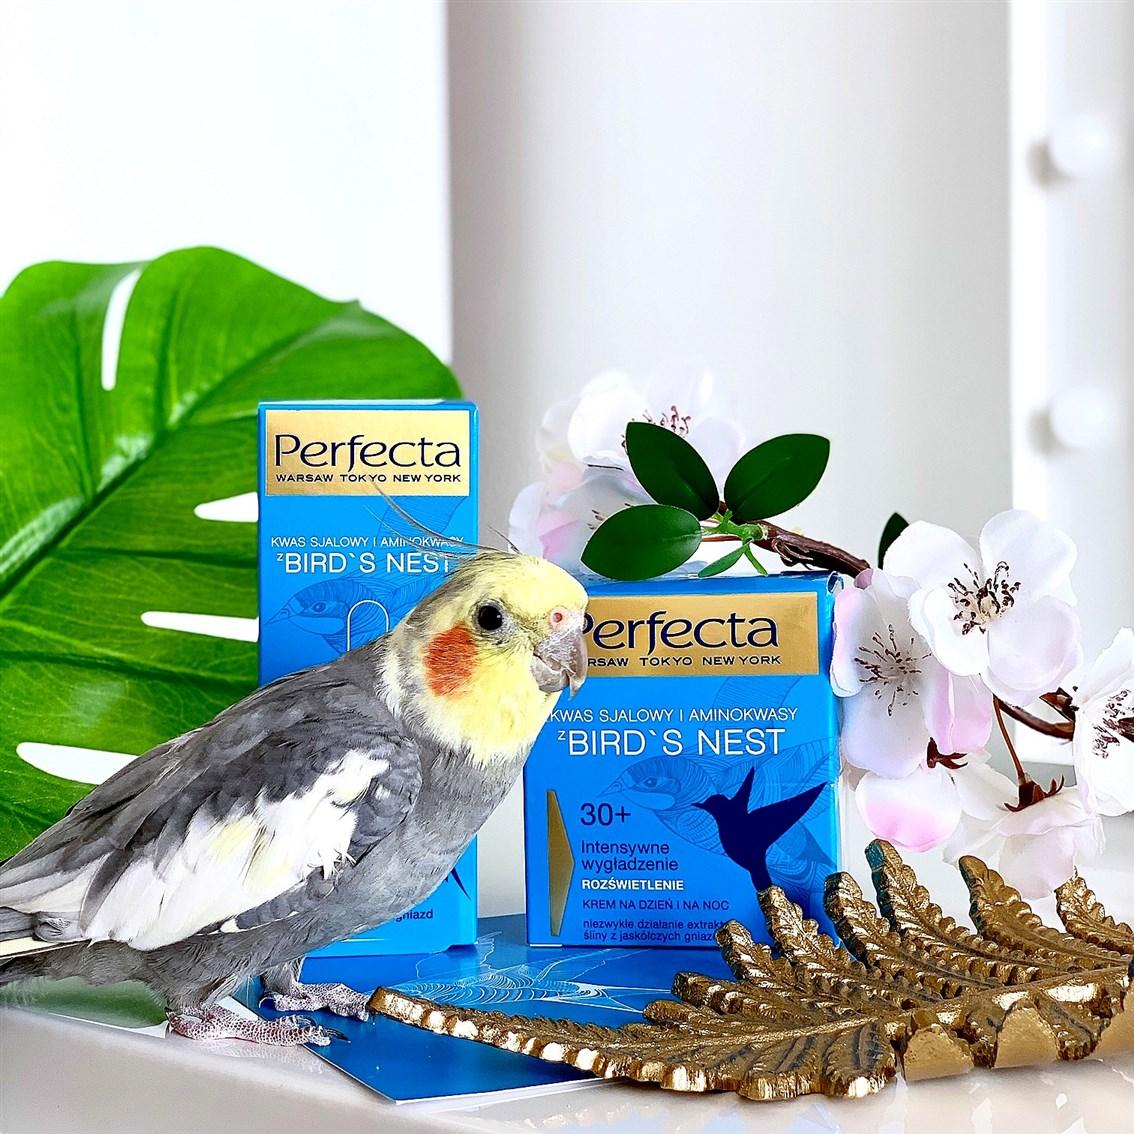 Perfecta Bird's Nest krem na dzień i na noc 30+